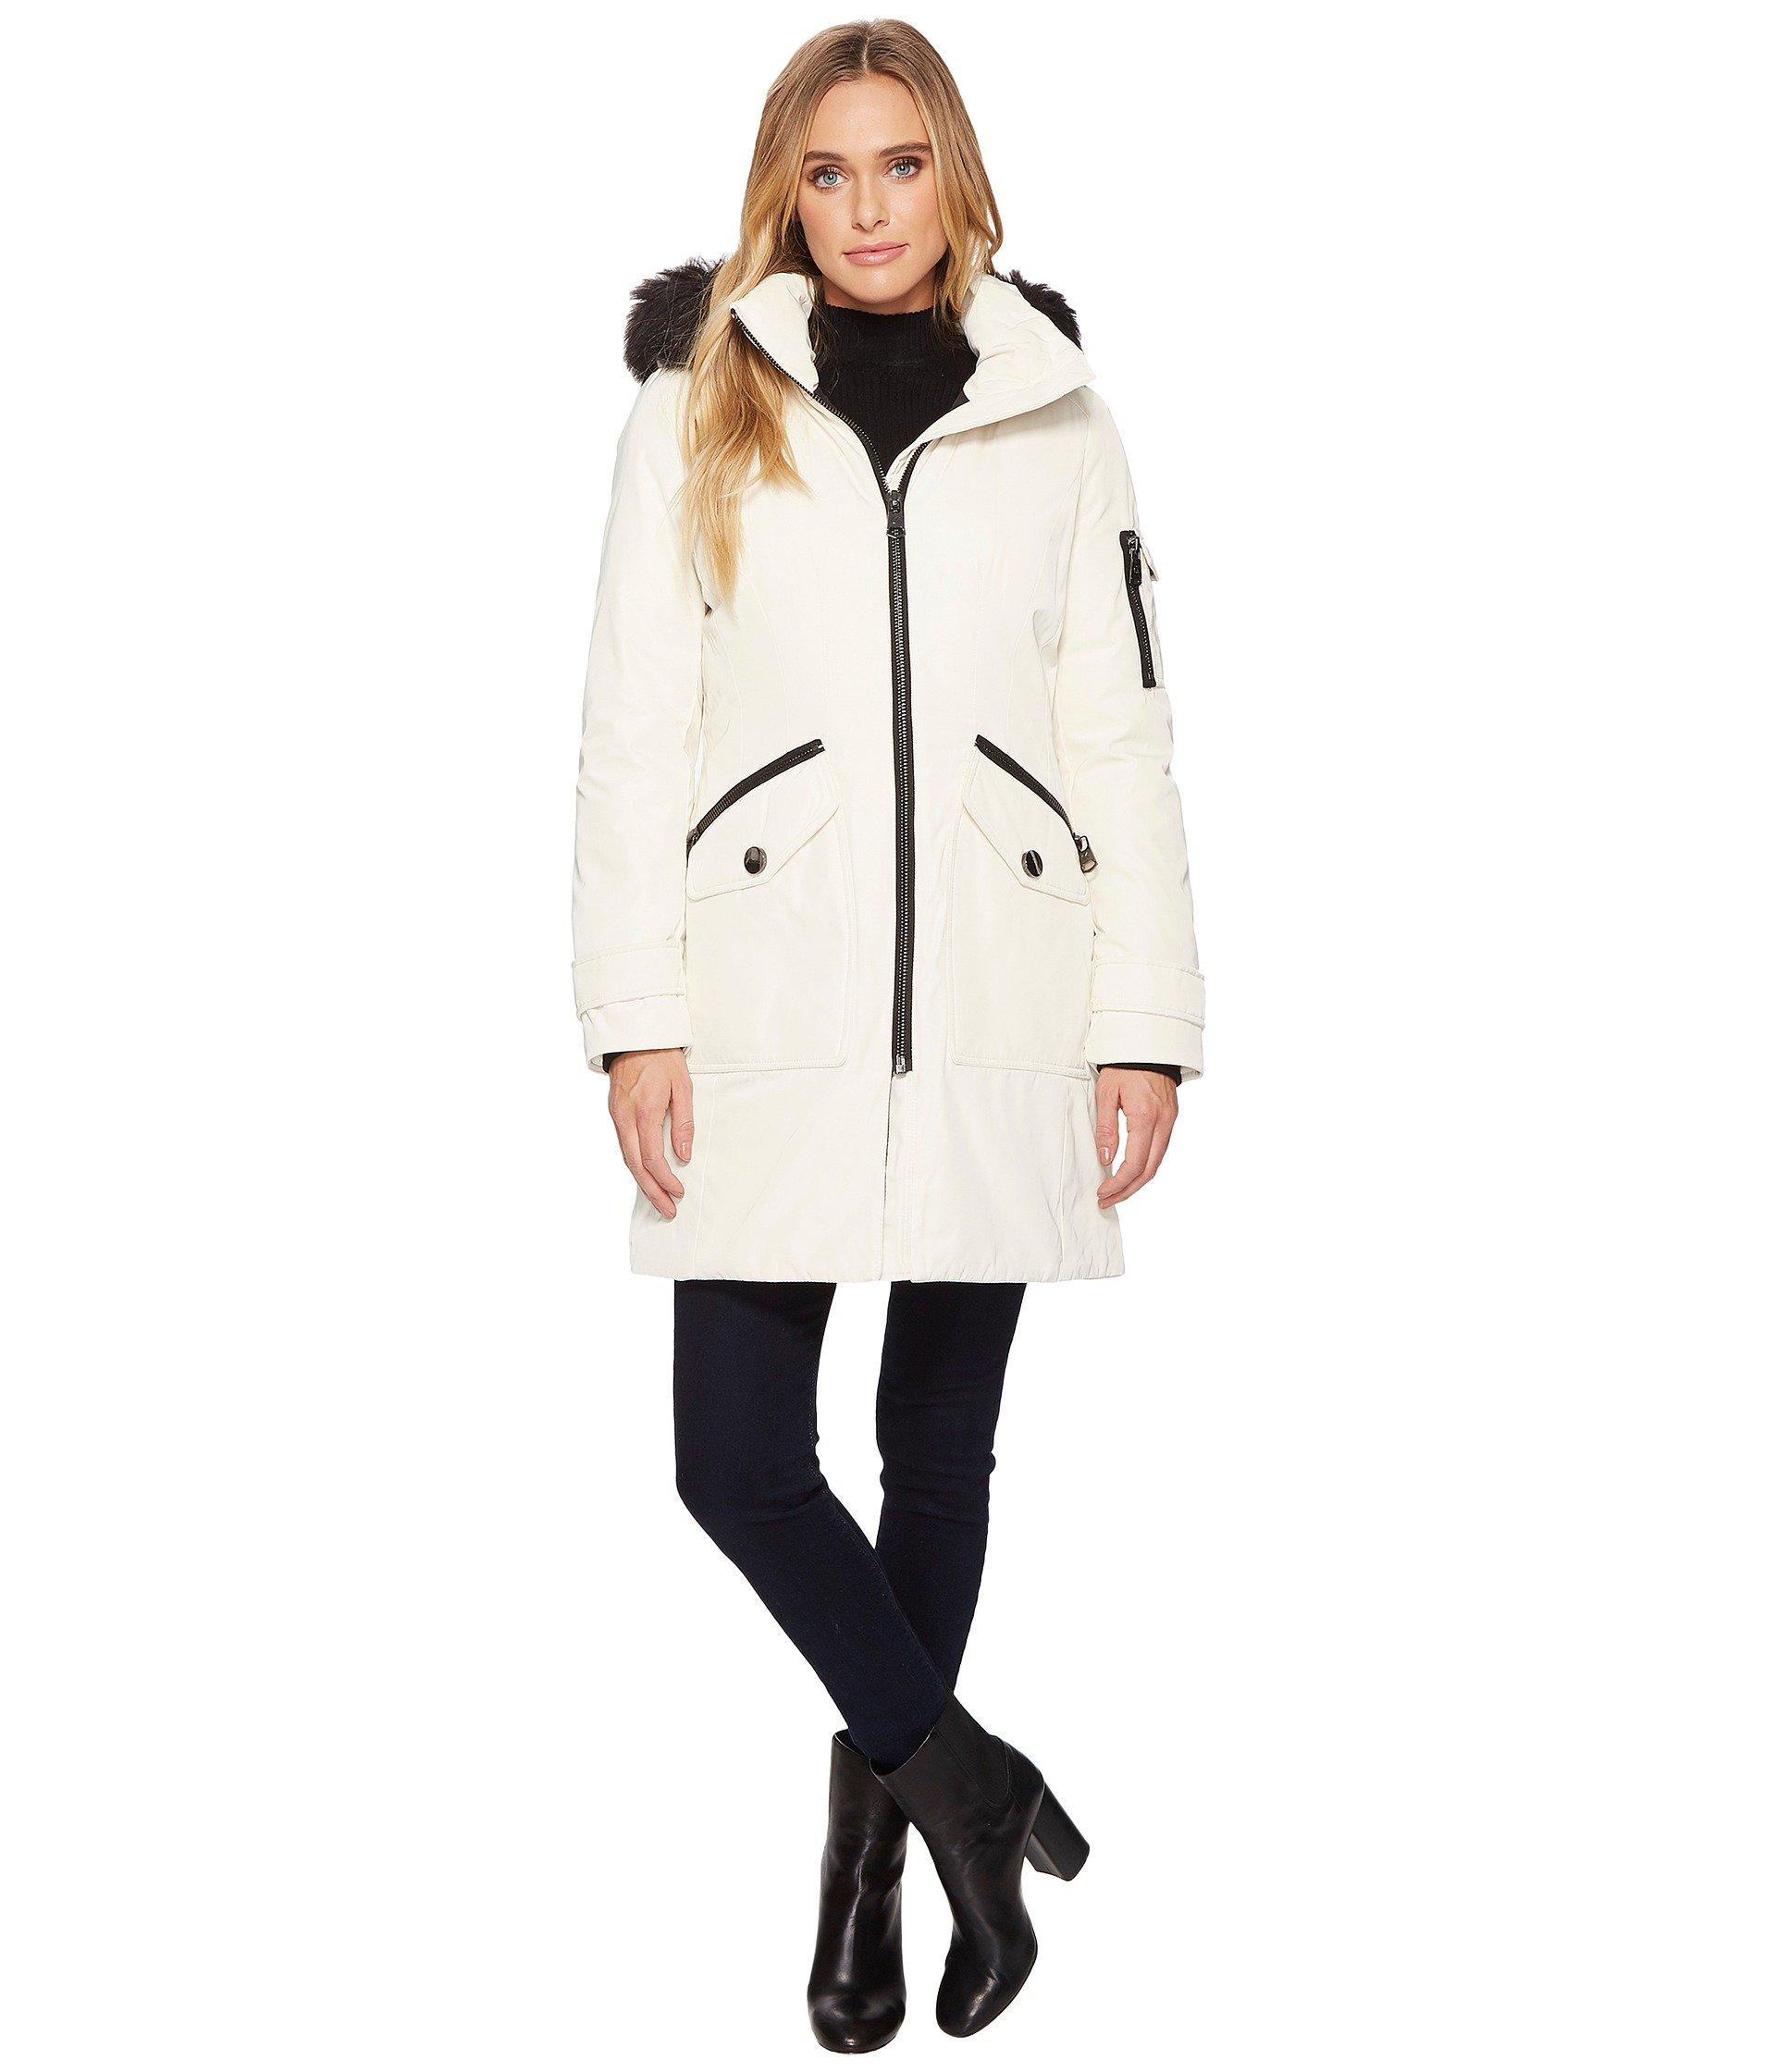 Parka with Detachable Fur Trimmed Hood